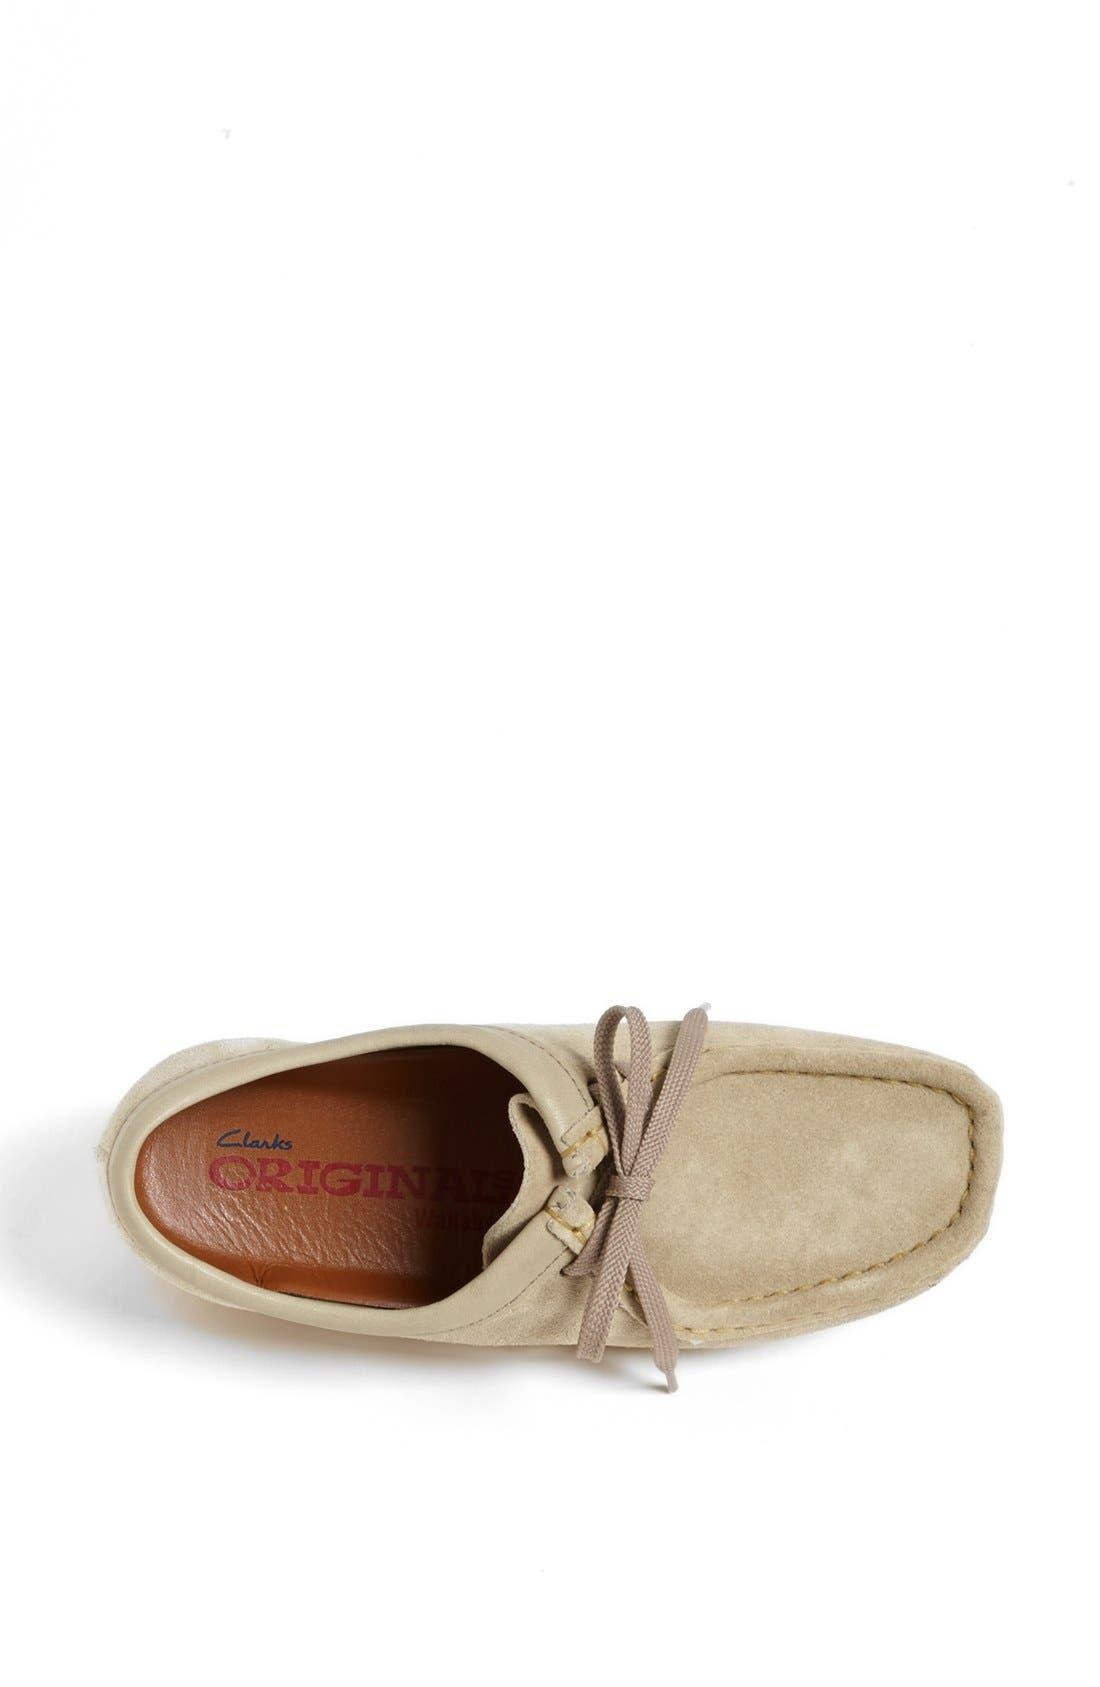 Alternate Image 3  - Clarks® Originals 'Wallabee' Loafer